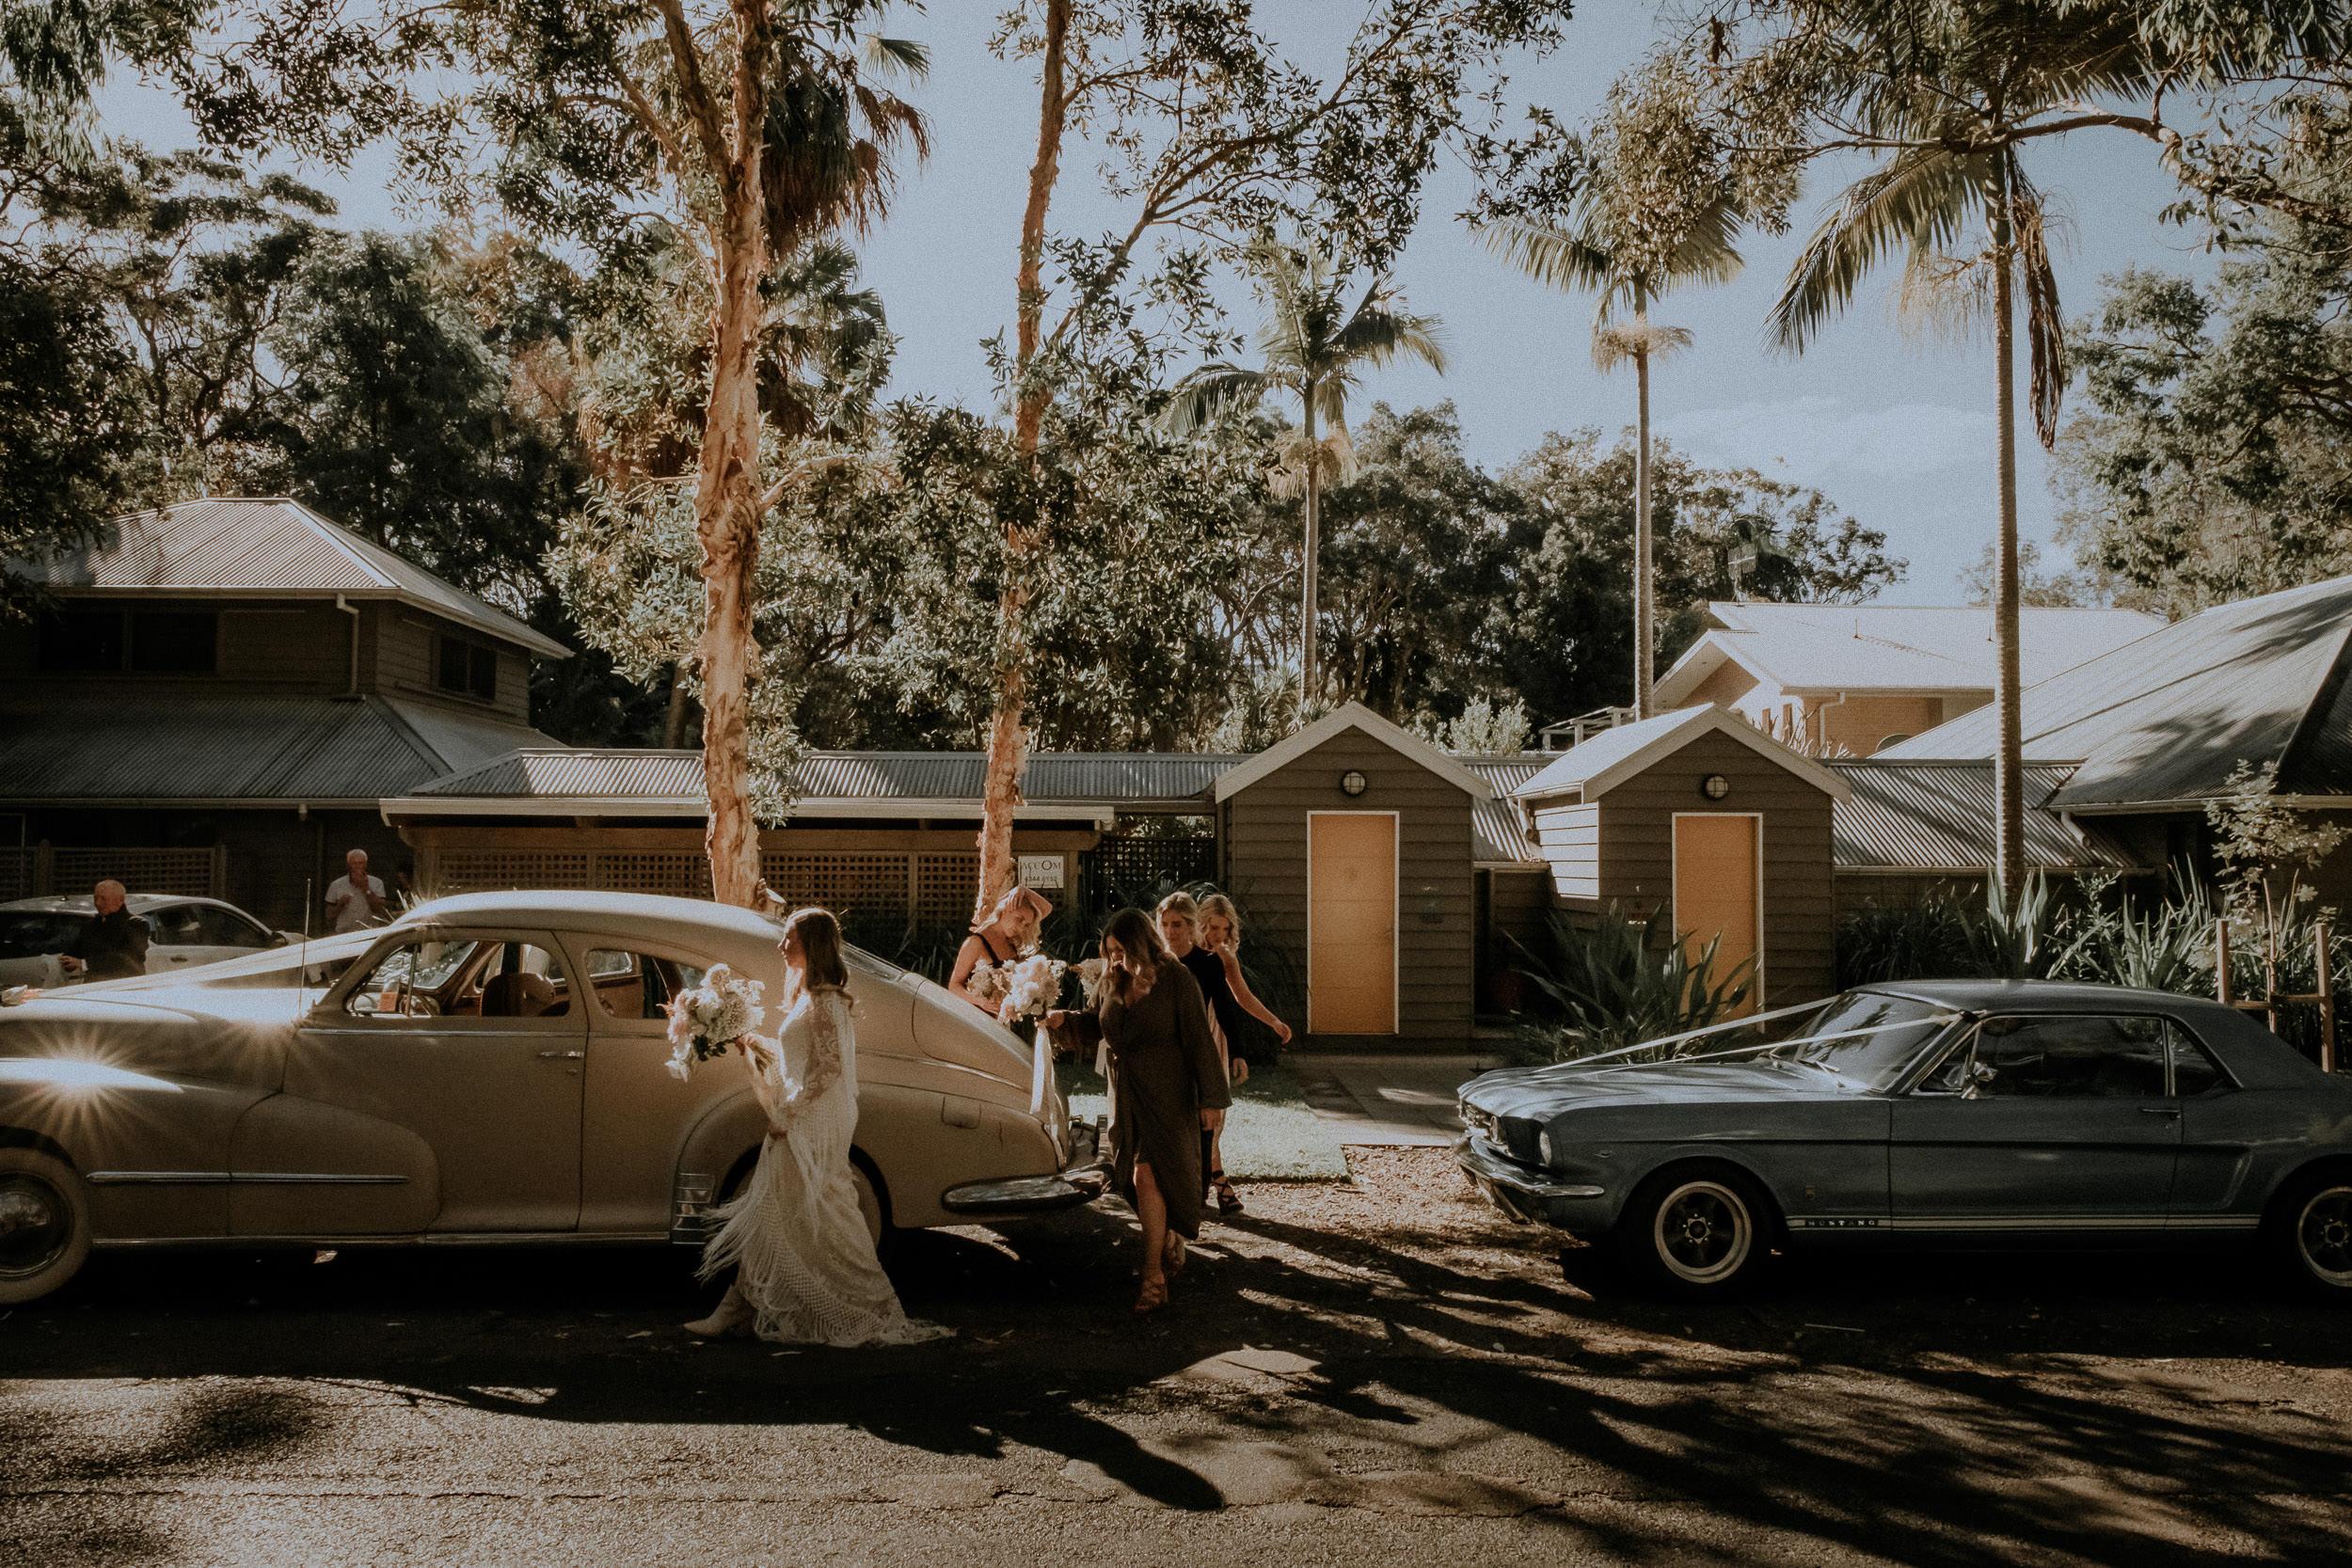 S&A Elopement - Kings & Thieves - Shred 'Til Dead - Central Coast Beach Forest Wedding - 123.jpg